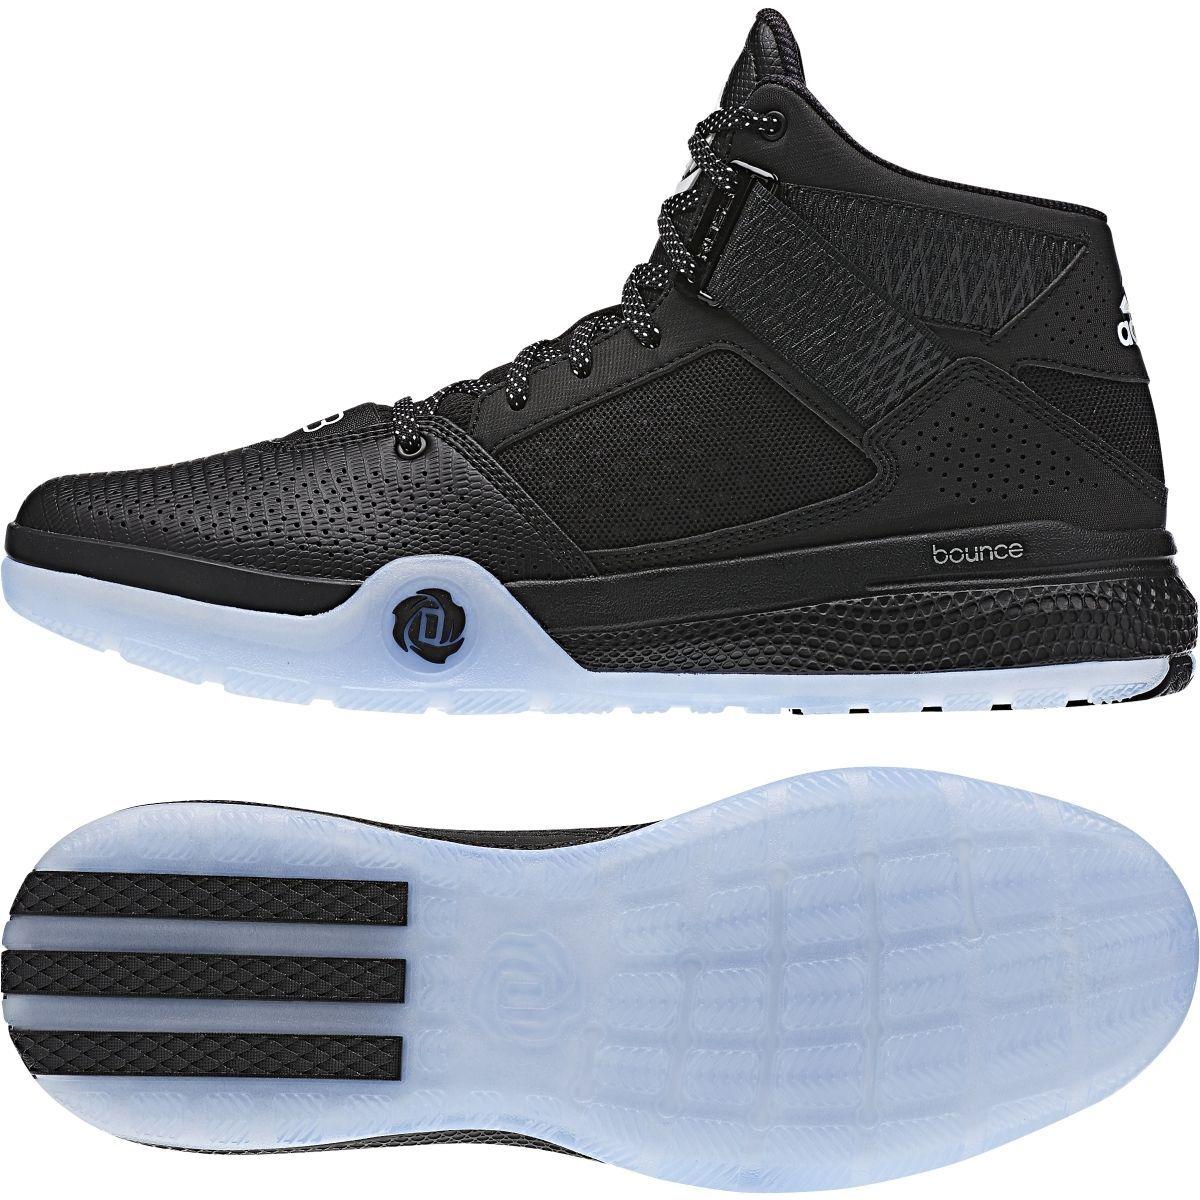 Los hombres 158971: adidas D Rose 773 IV hombre s Basketball zapatos (d69492